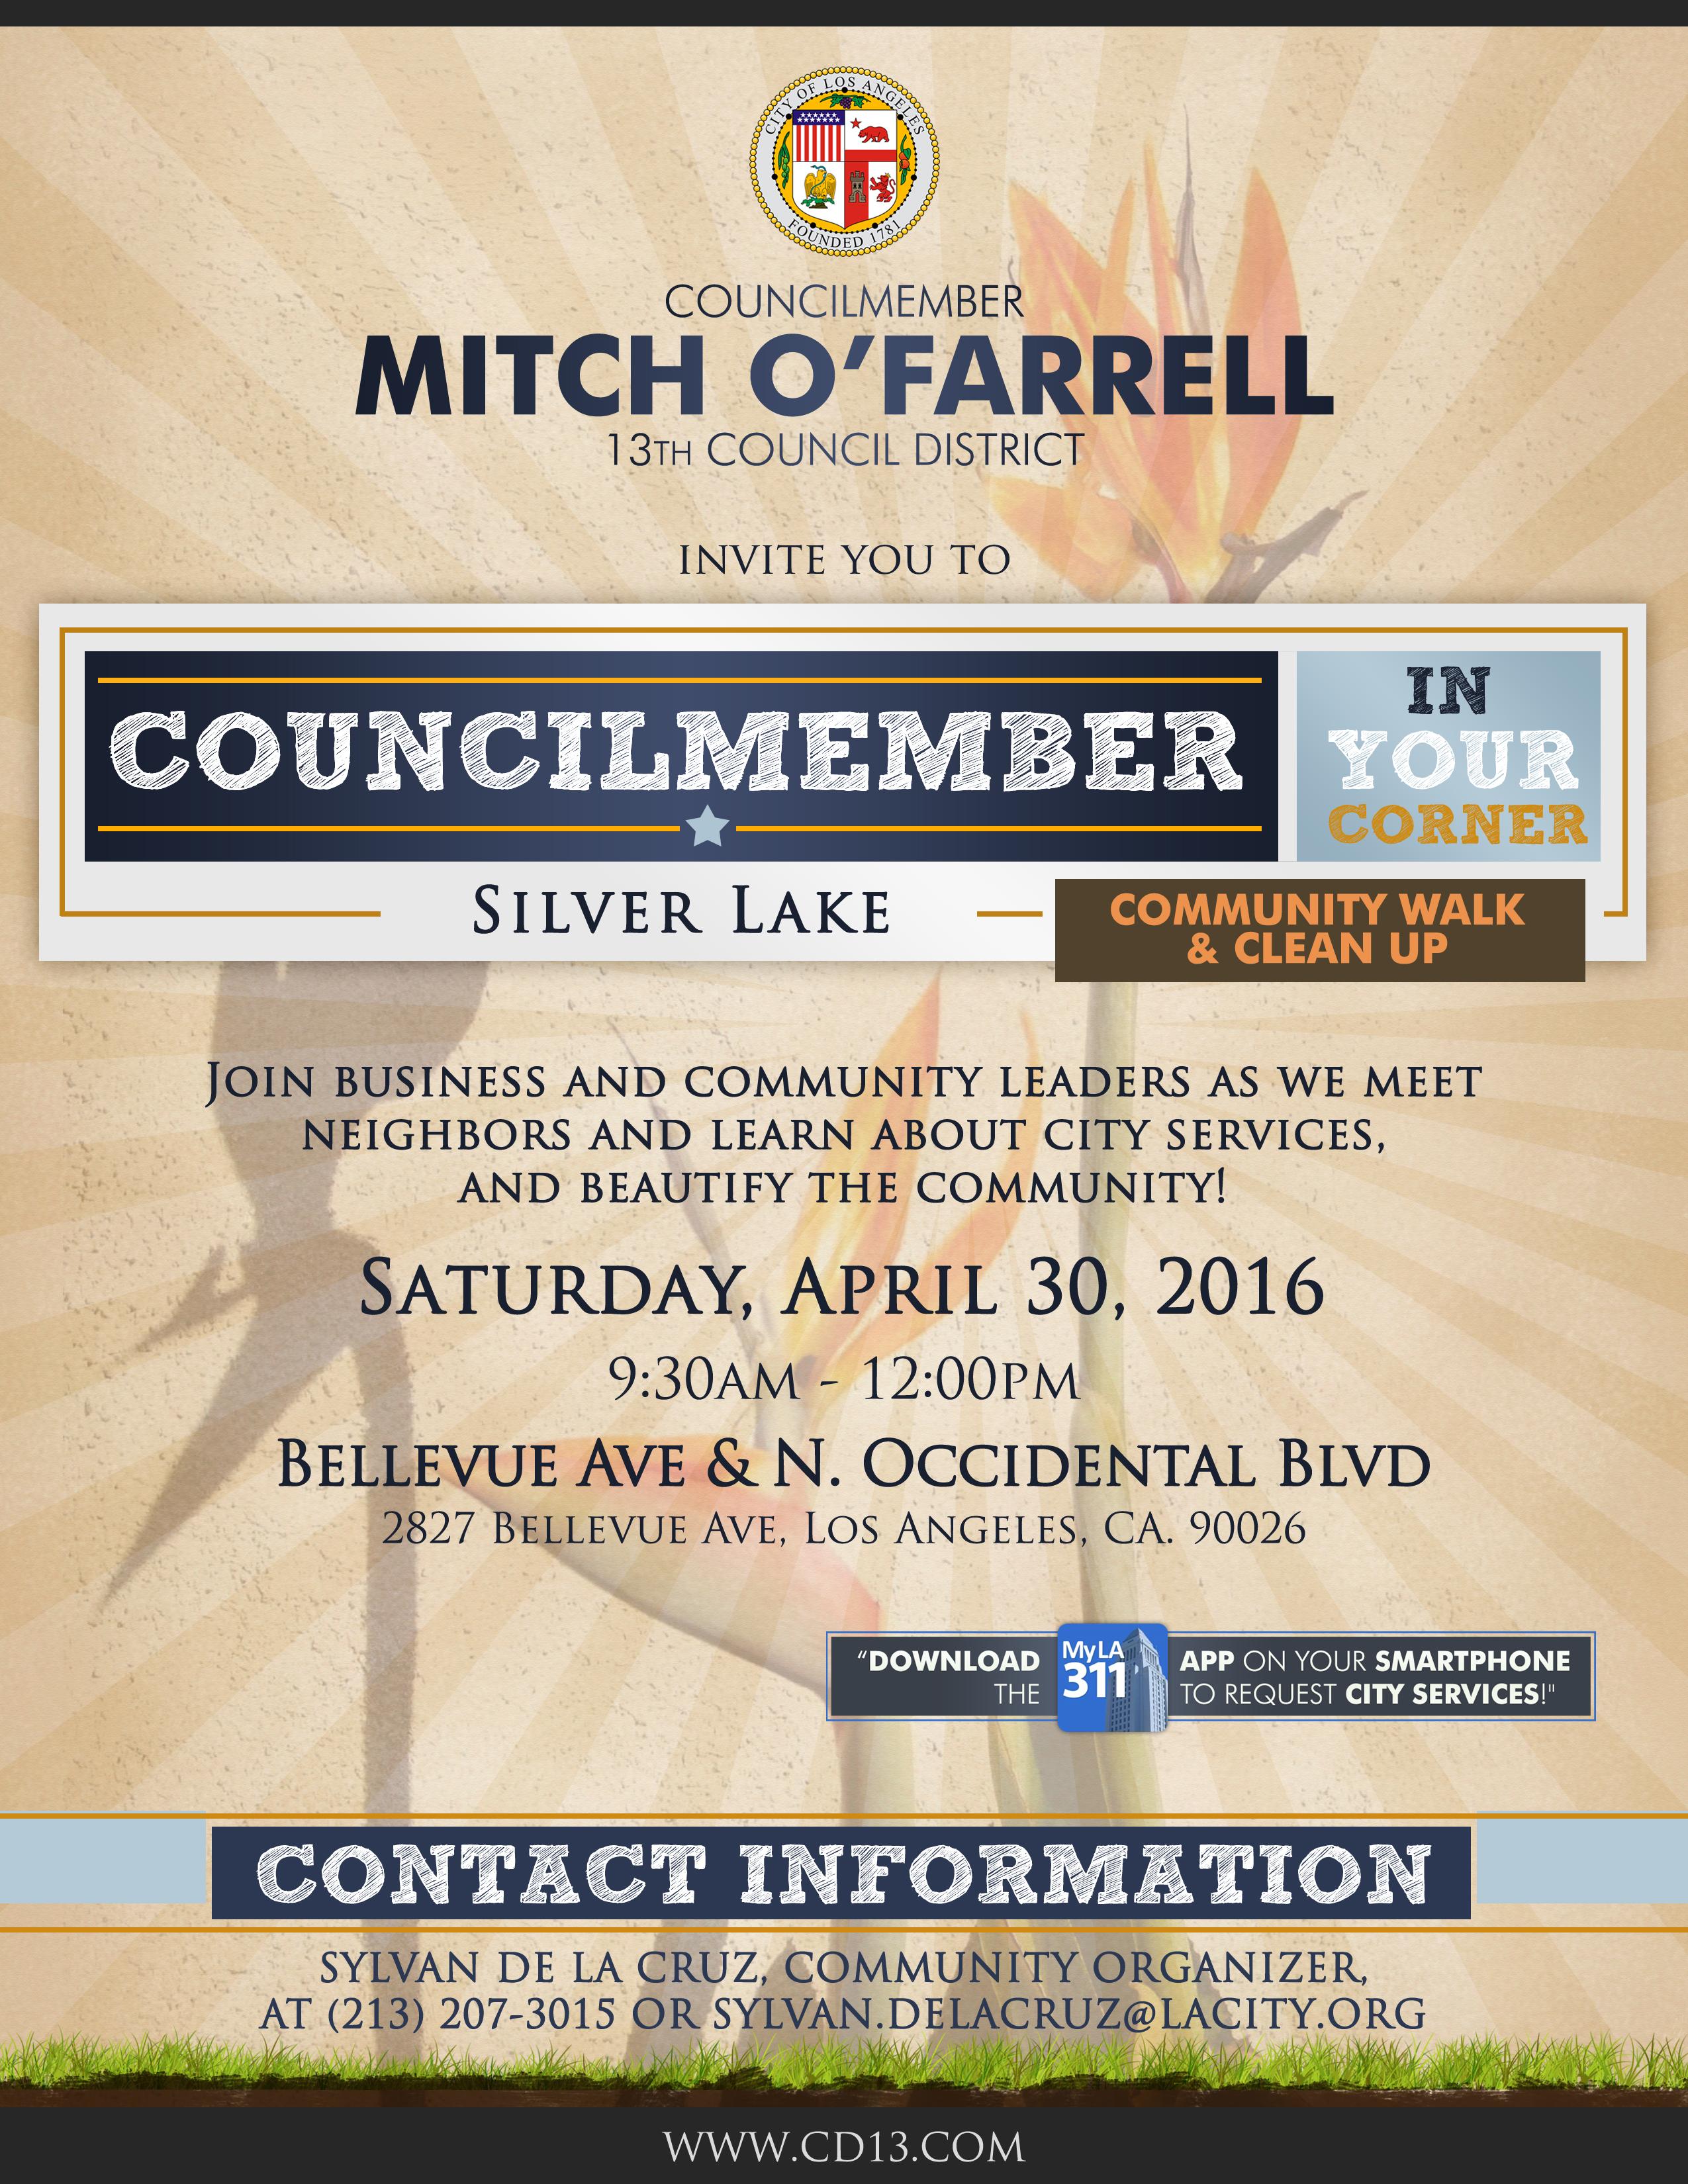 Councilmember_In_Your_Corner_(April_2016).jpg